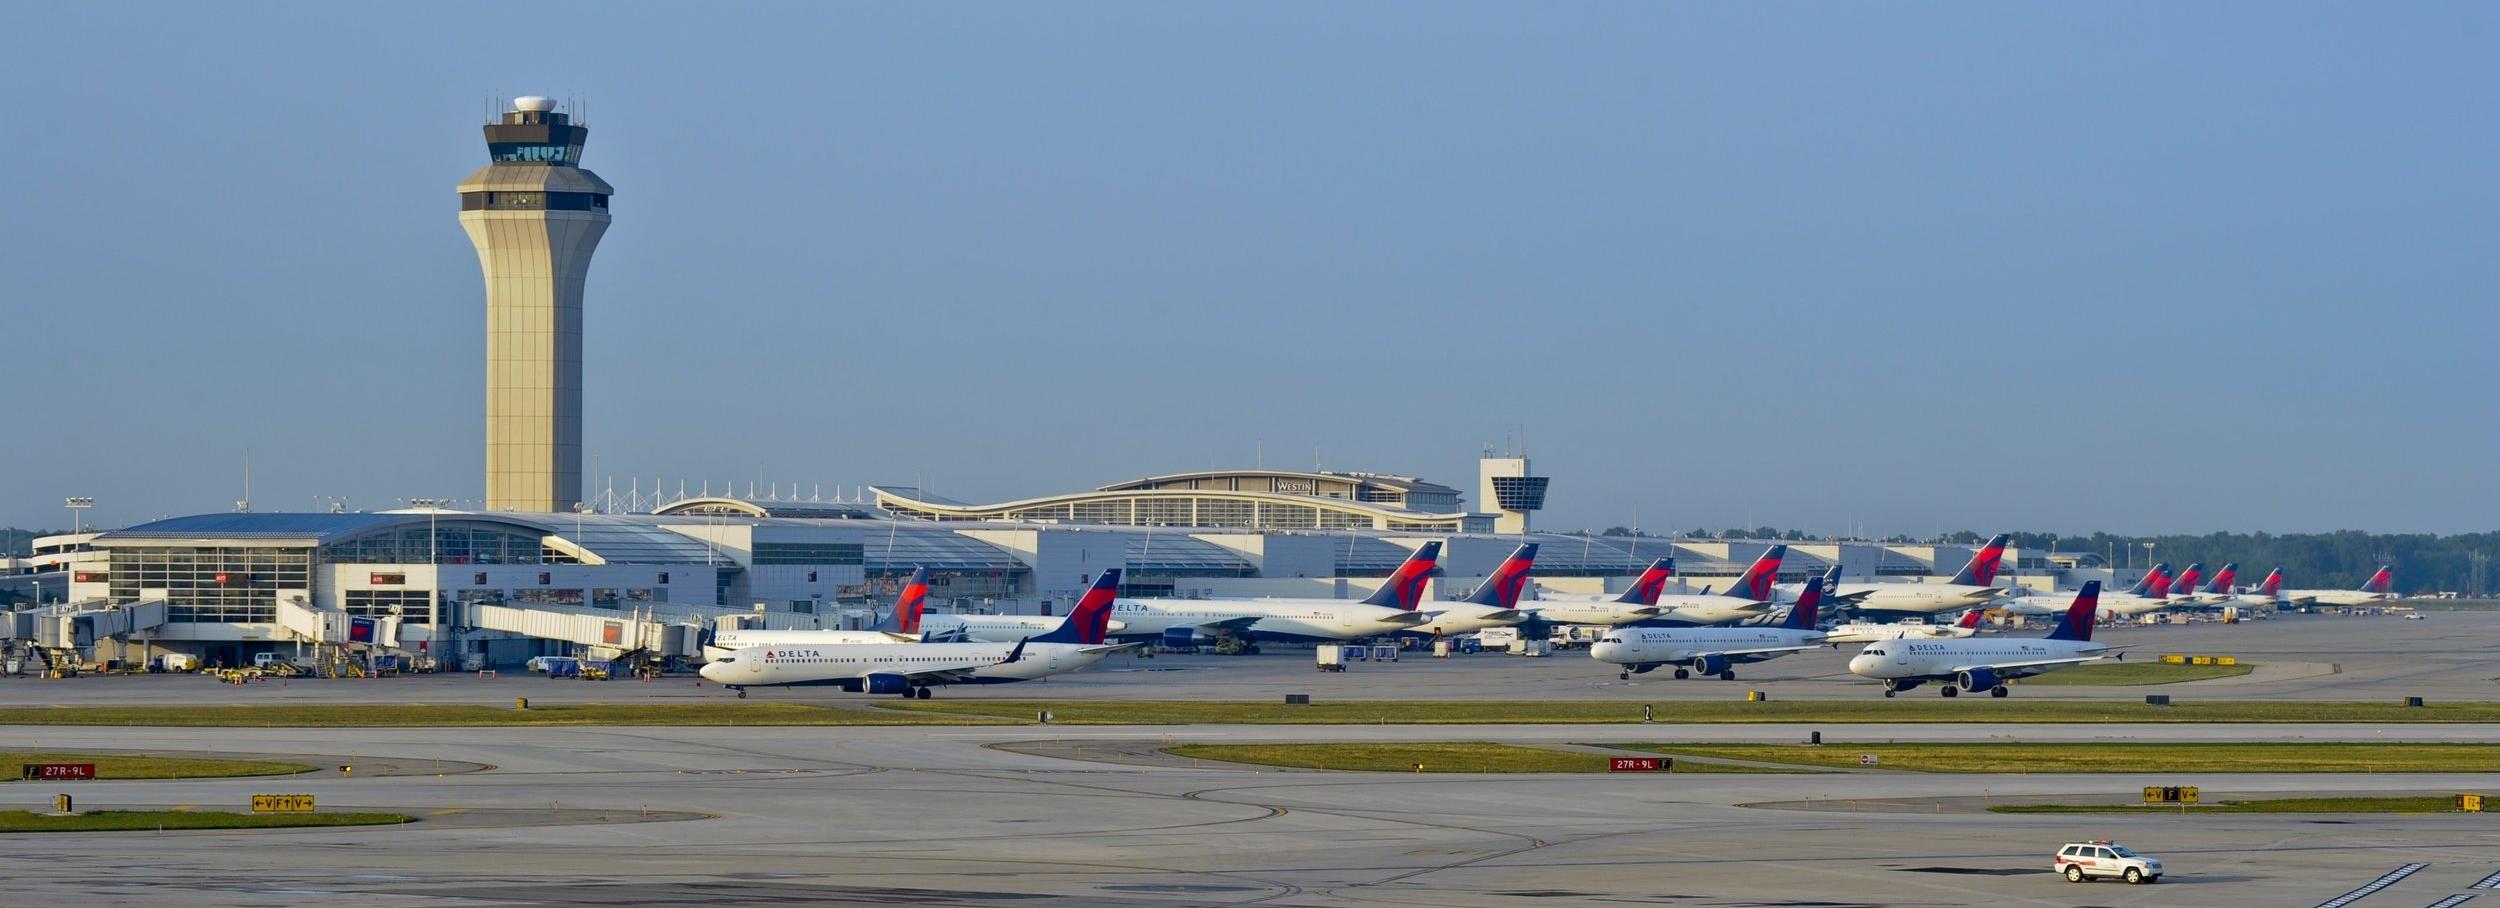 CREDIT: Wayne County Airport Authority